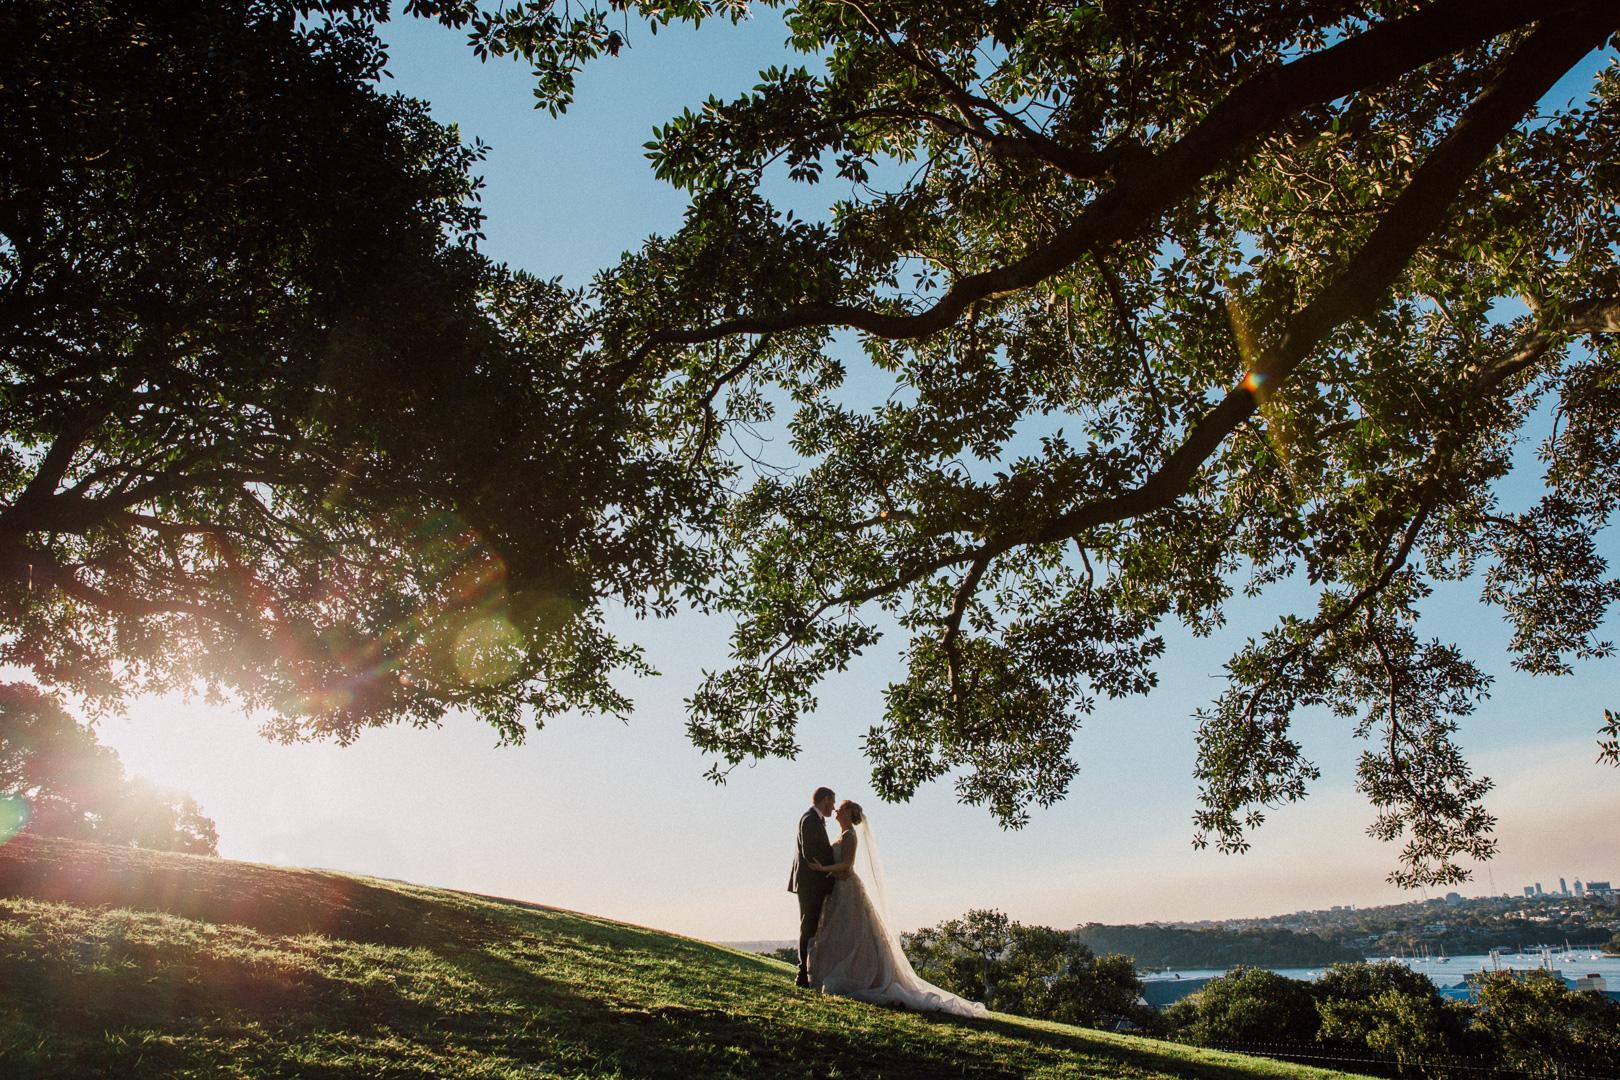 Walsh_bay_natural_candid__wedding_Photographer_001.jpg